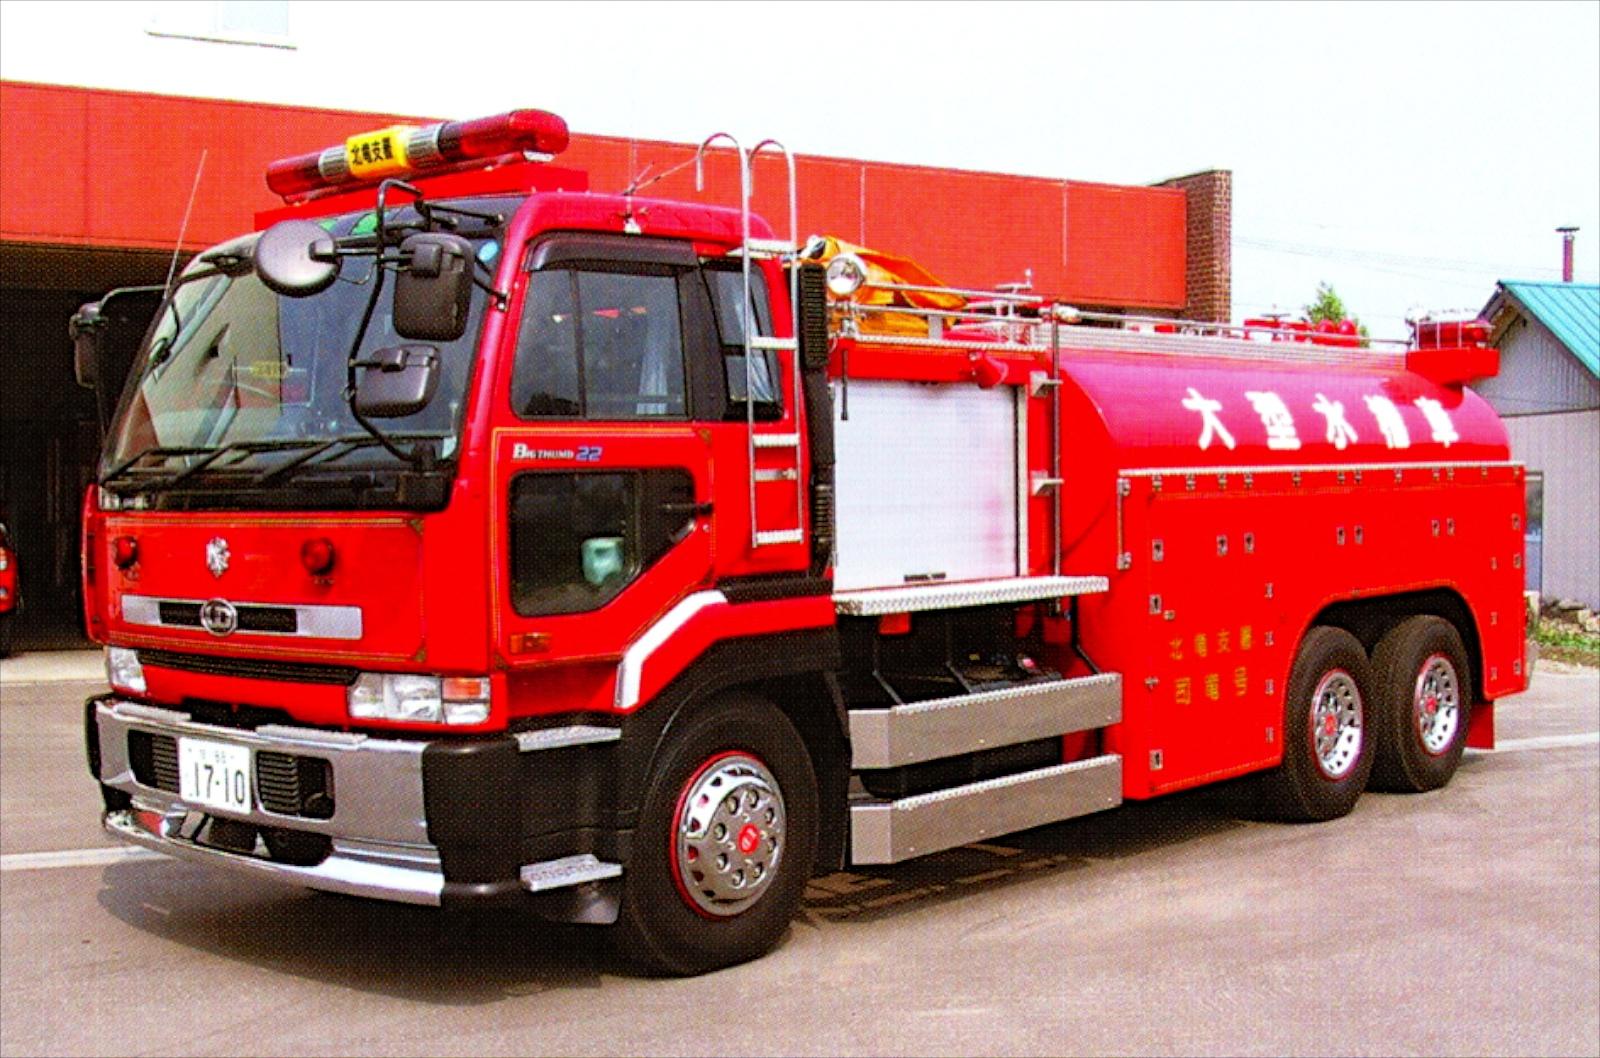 Photo: 大型水槽車「司竜号」 水 10,000リットル積載 セルプラ式